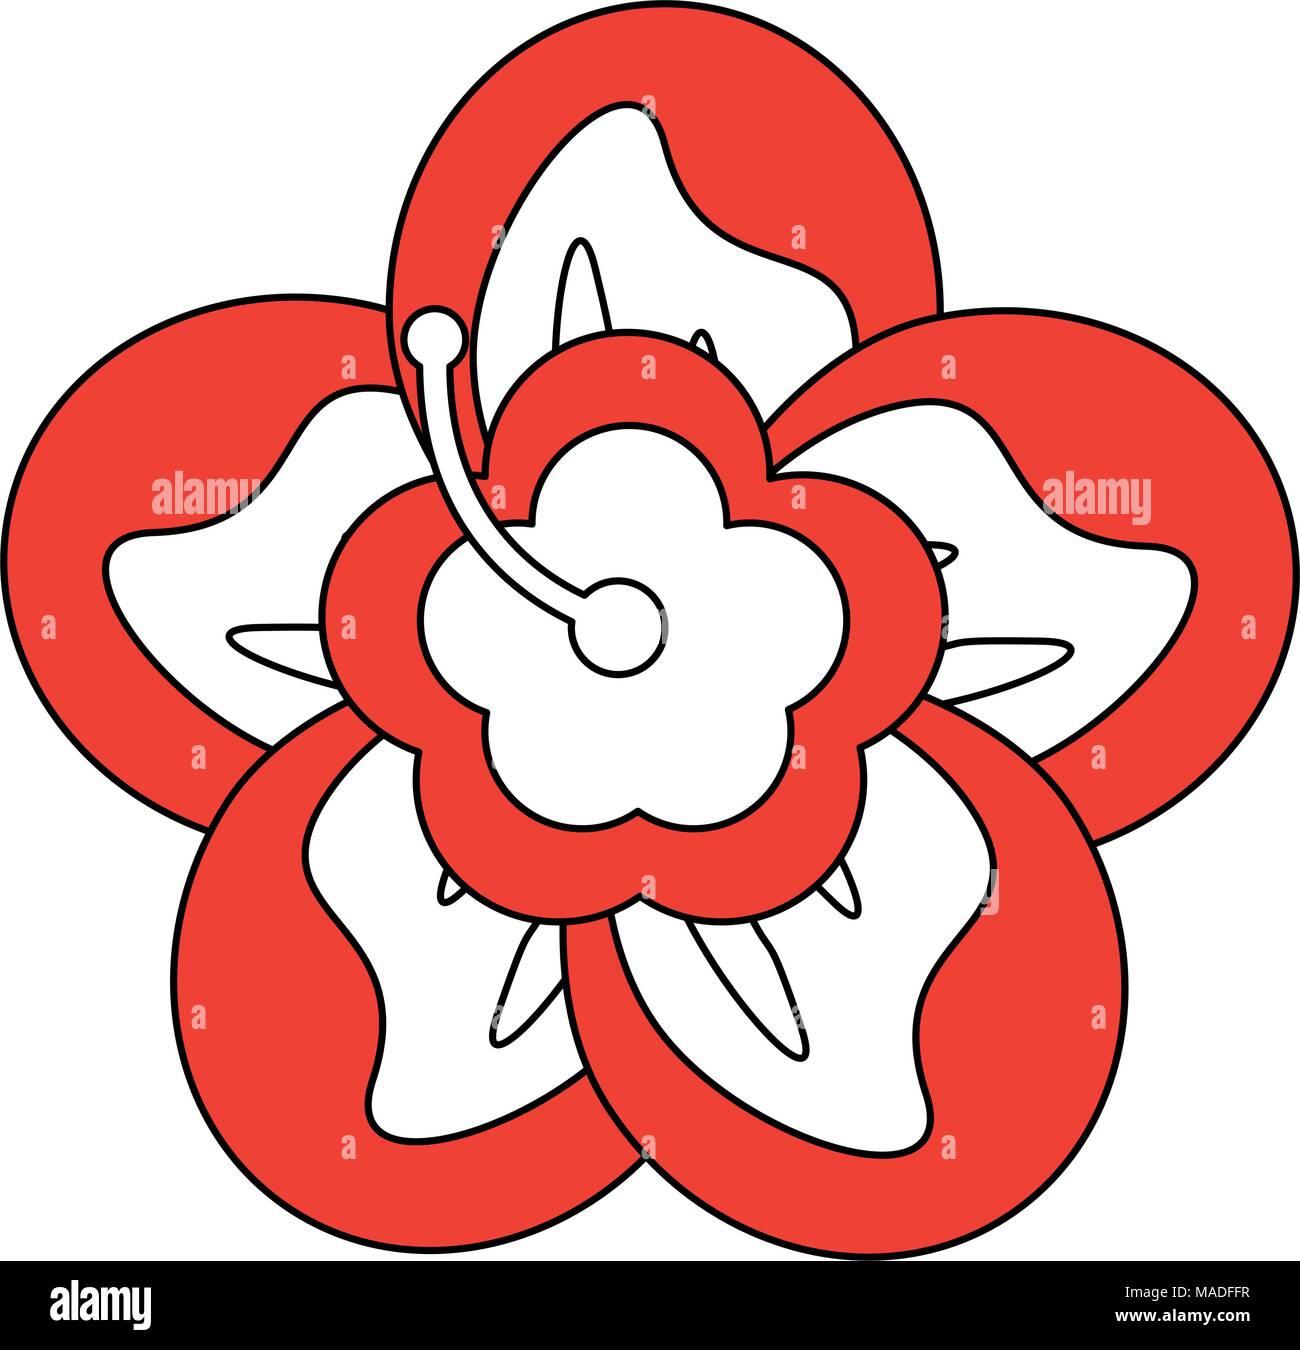 Beautiful Flower Cartoon Stock Vector Art Illustration Vector